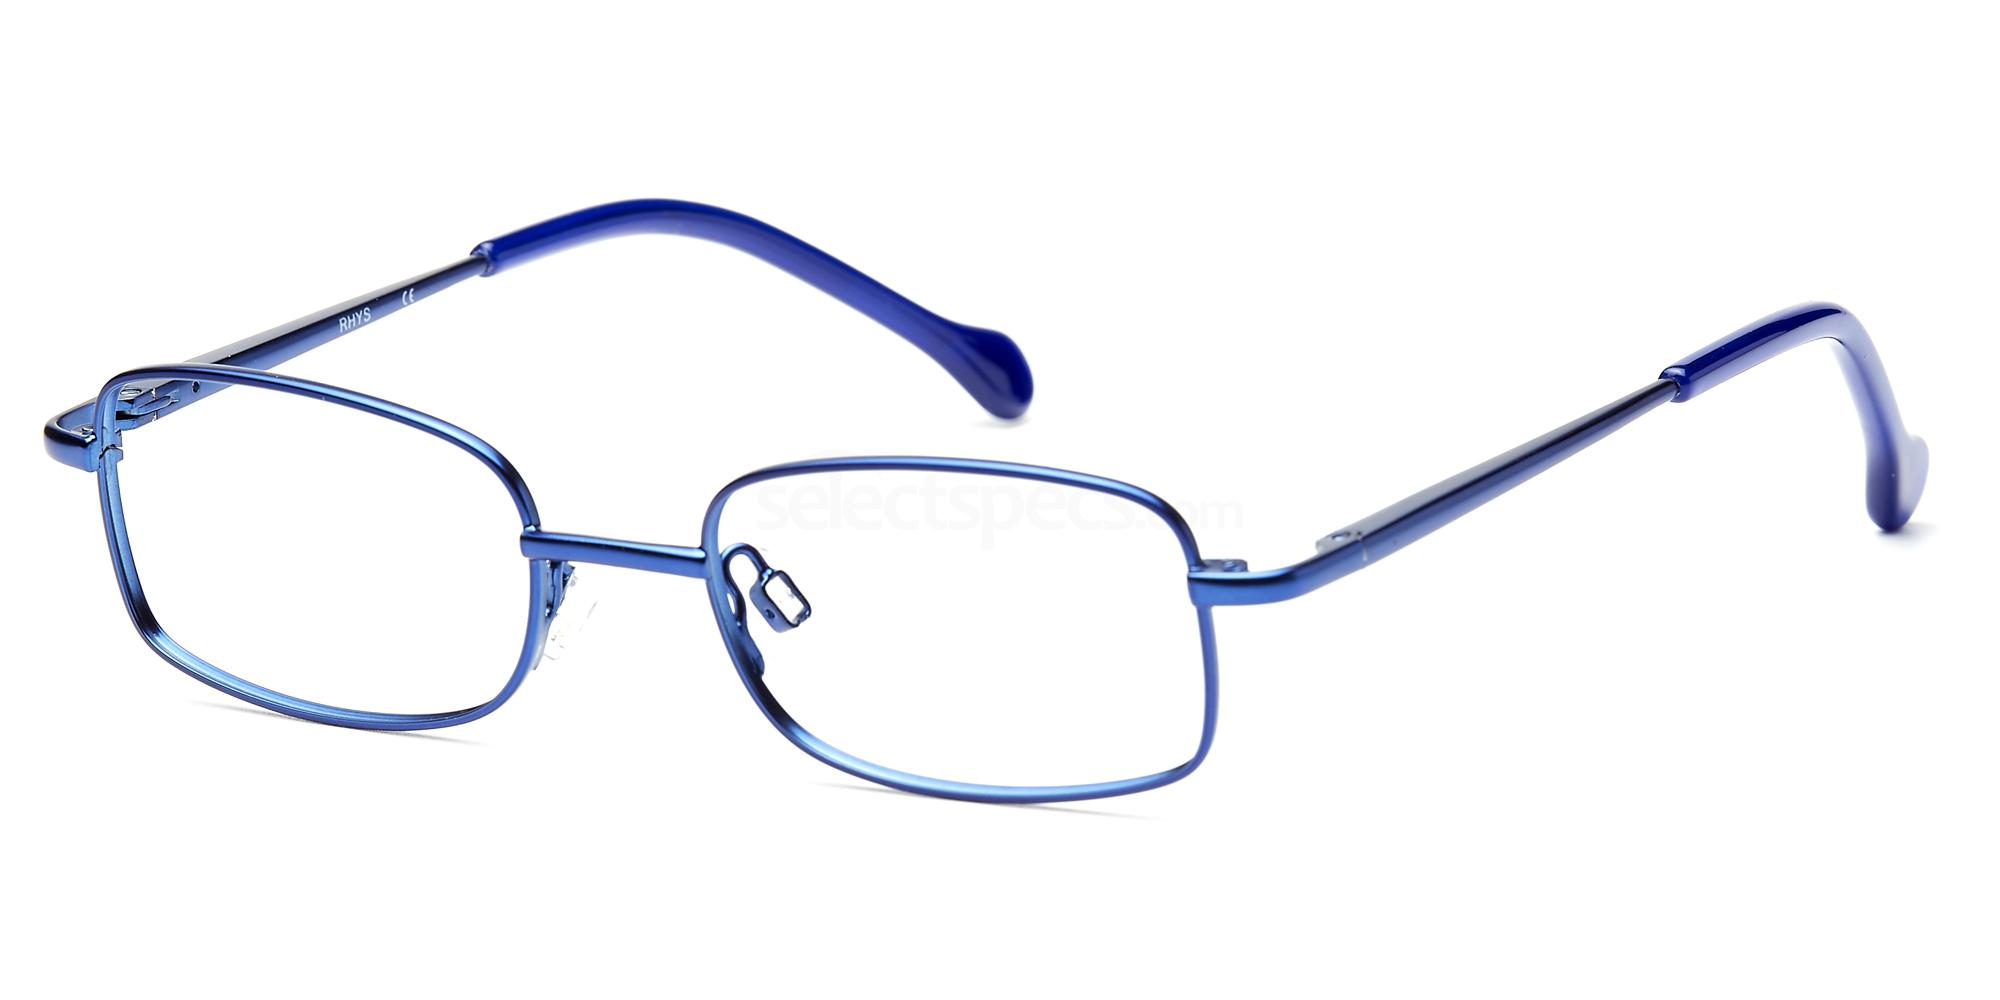 C1 RHYS Glasses, Top Secret KIDS